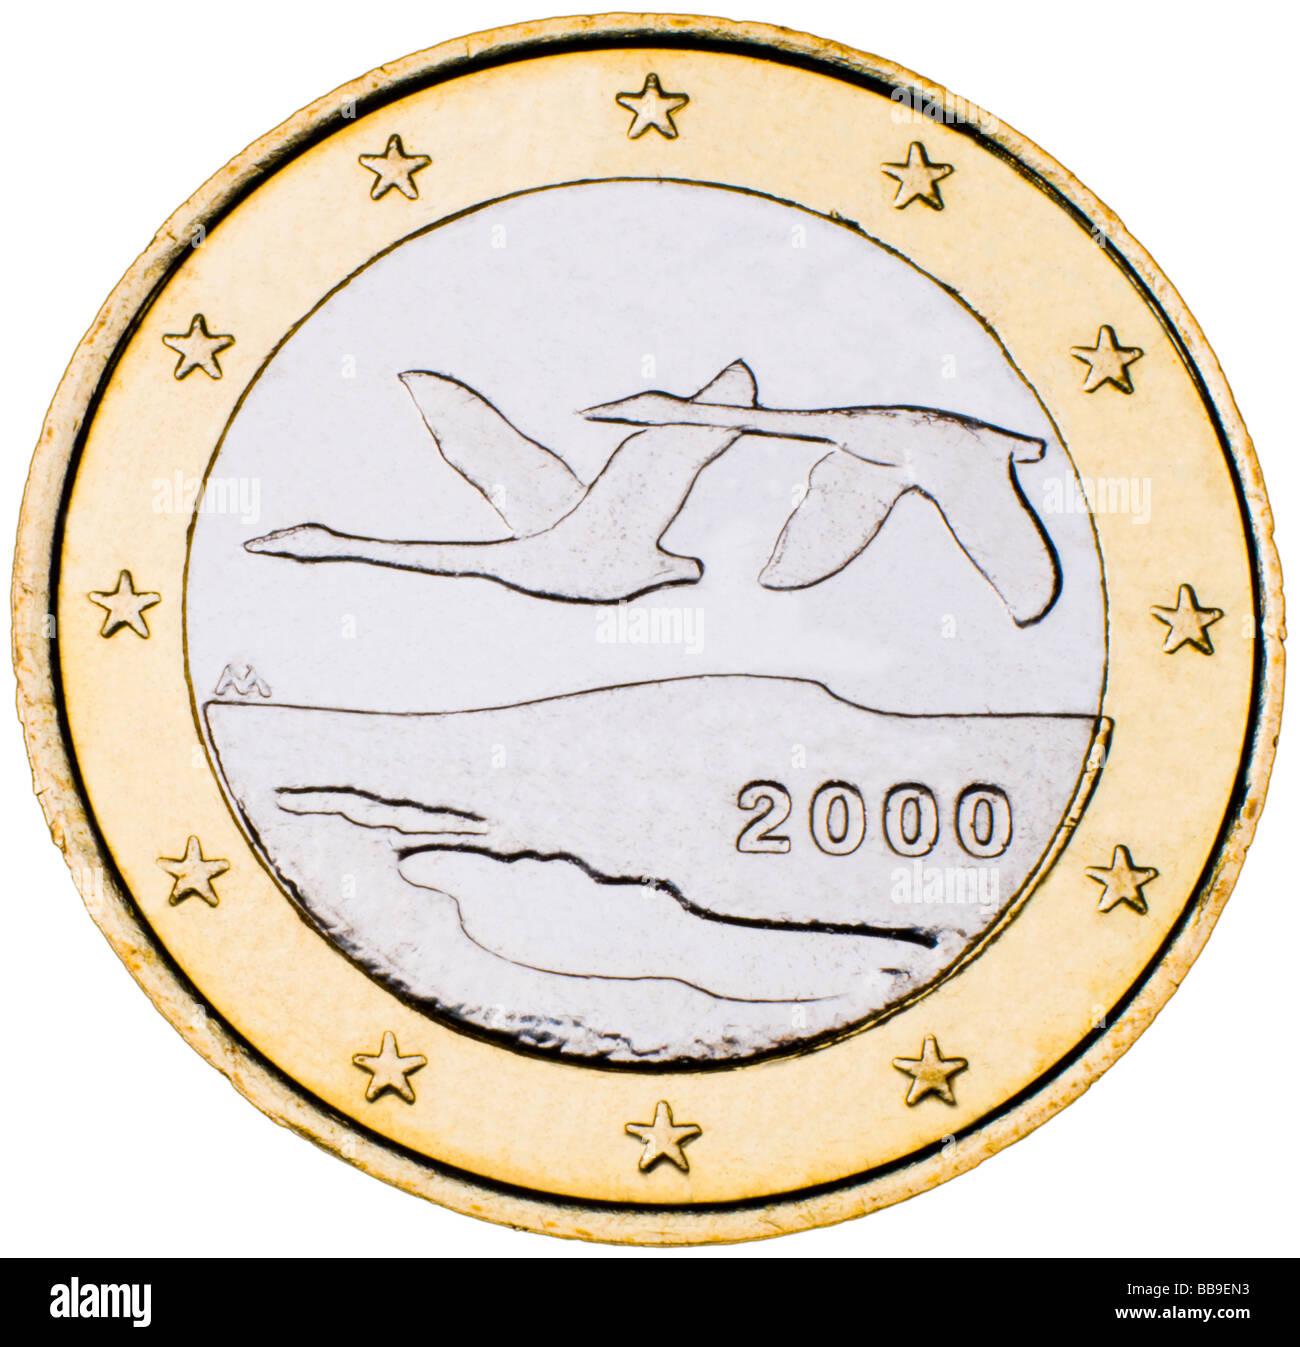 Finland 1 Euro Coin reverse - Stock Image